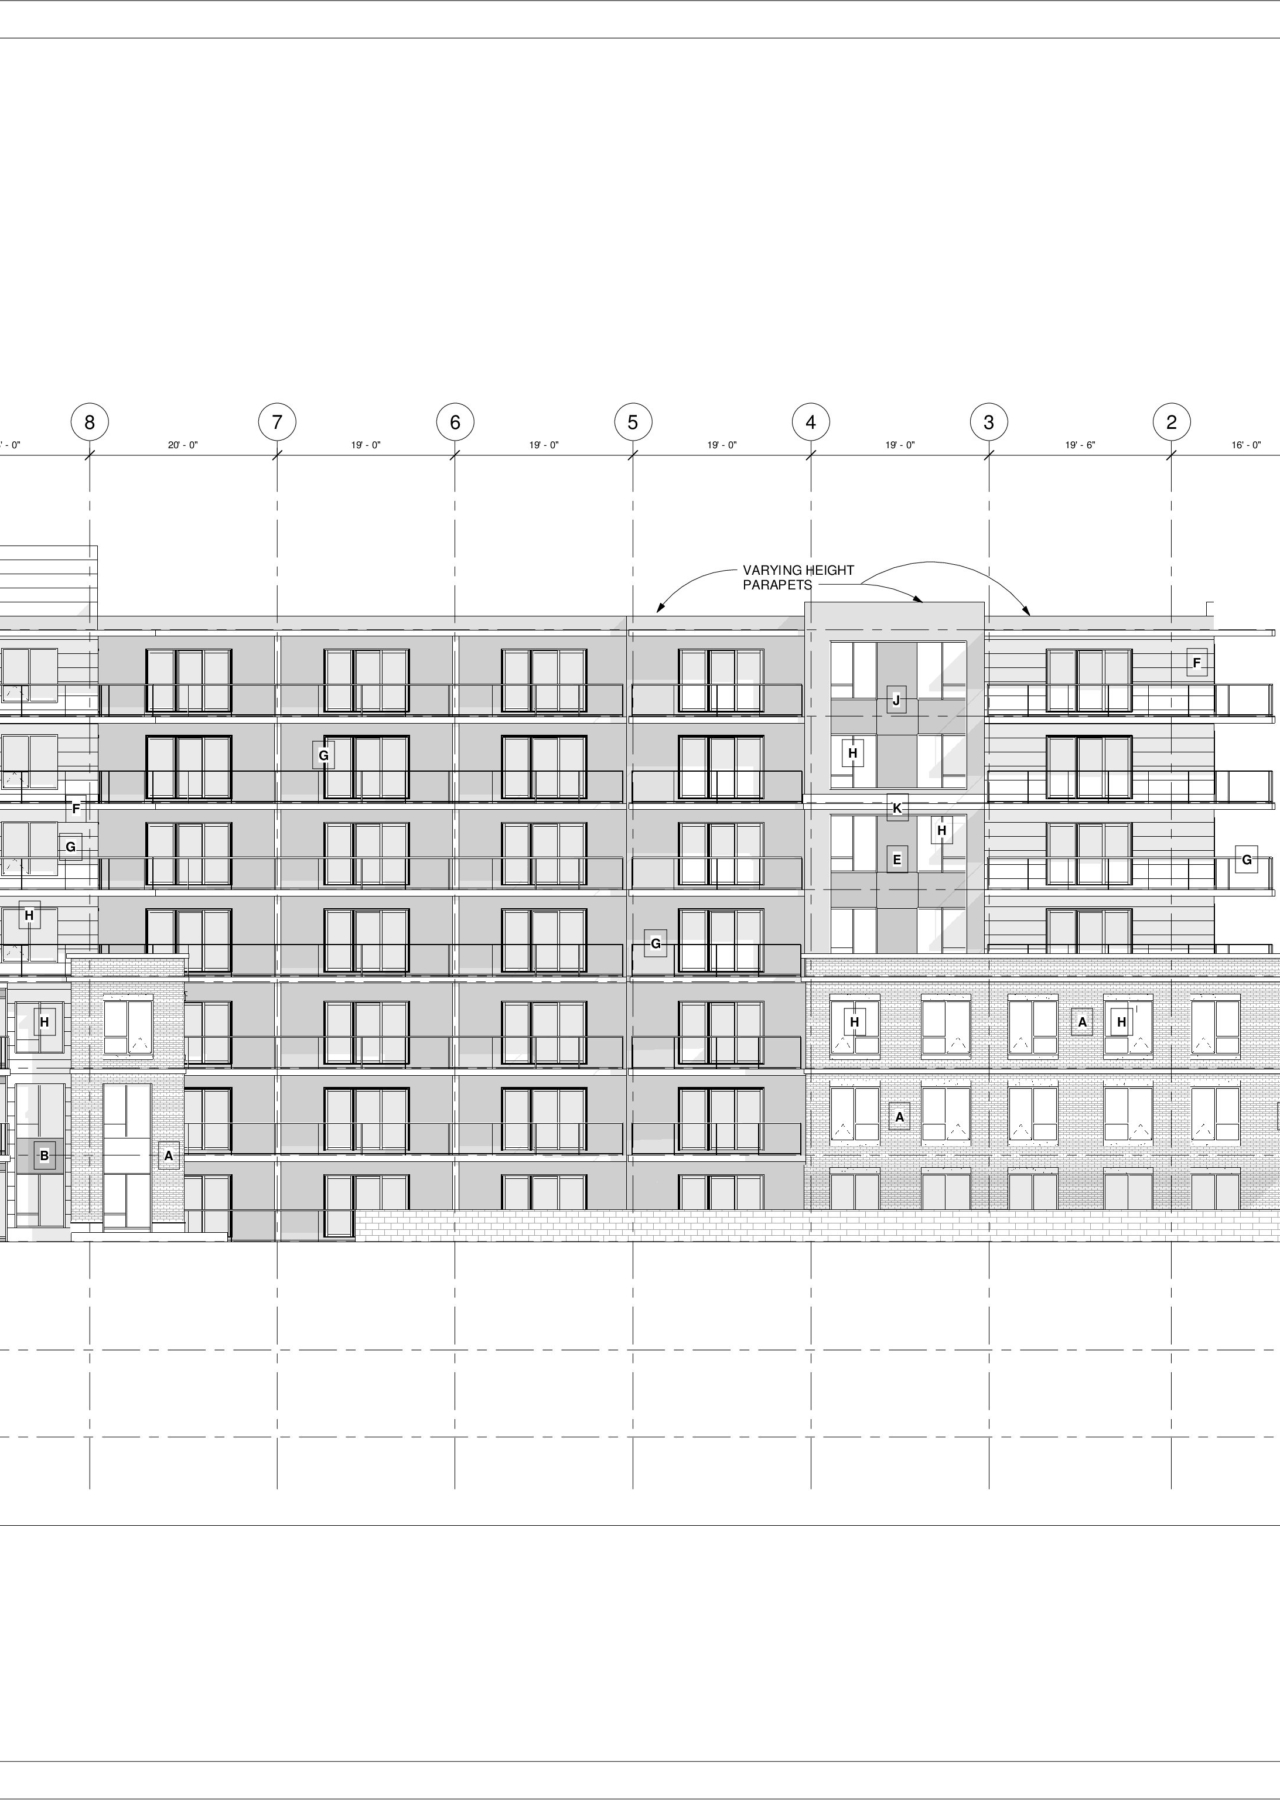 3093 Oxford – North – Sheet – A4-3 – North Elevation